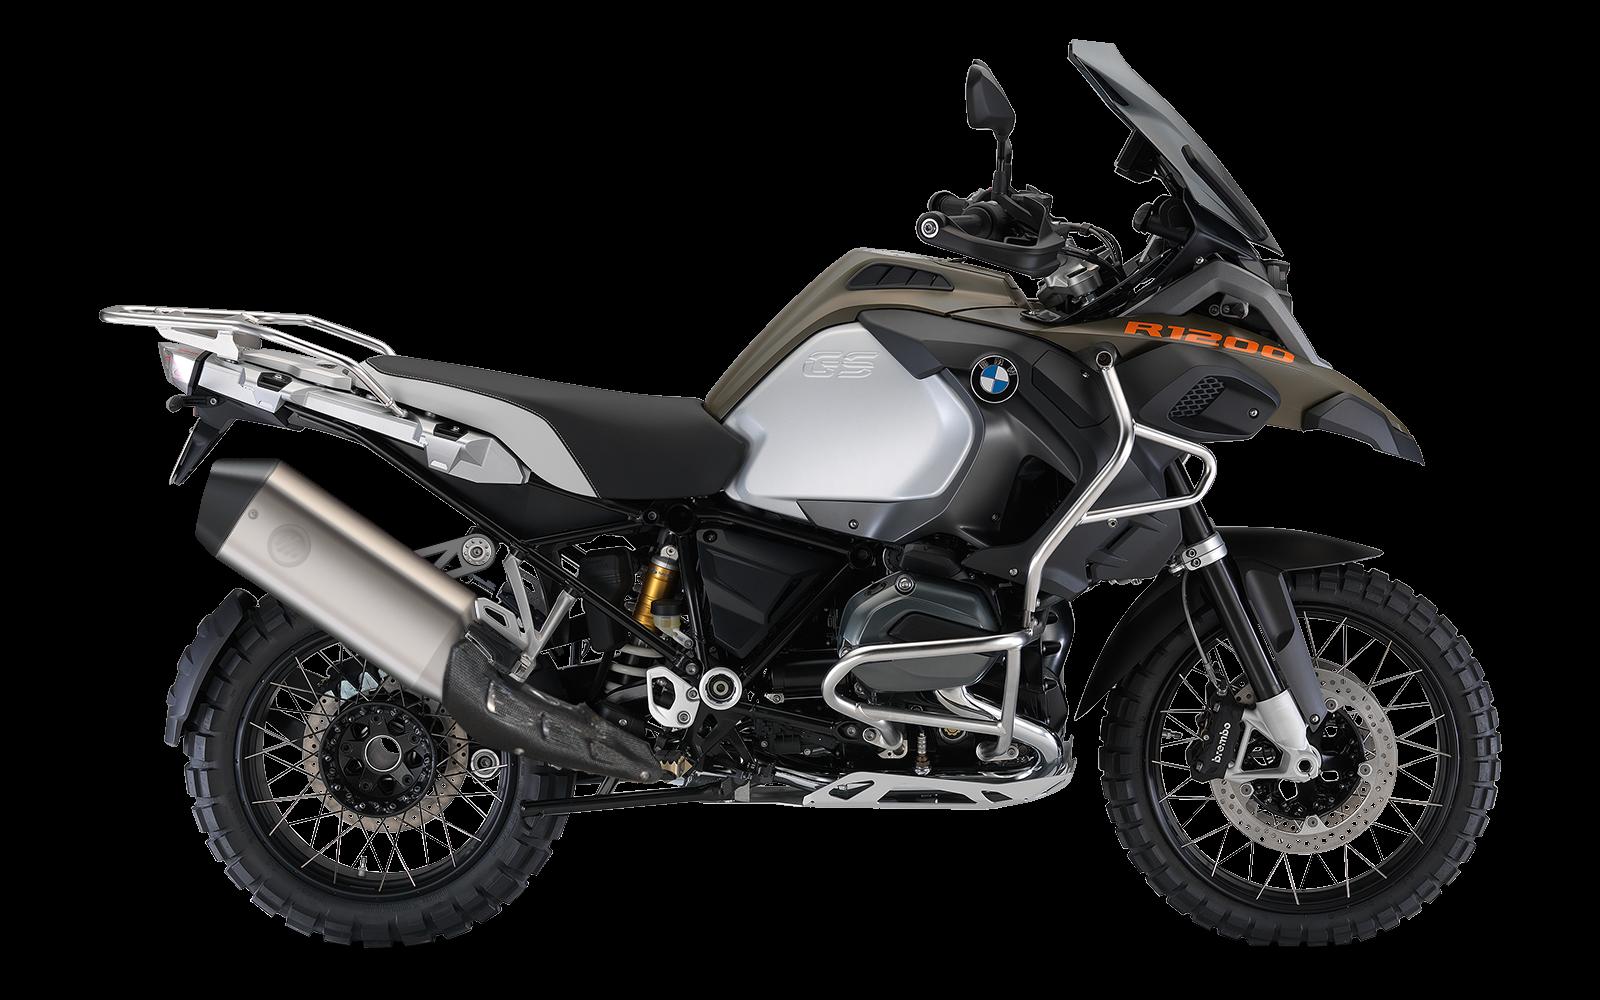 Adventure - R1200GS ADV - 1200 LC - 2017-2018 - Slipons adjustable